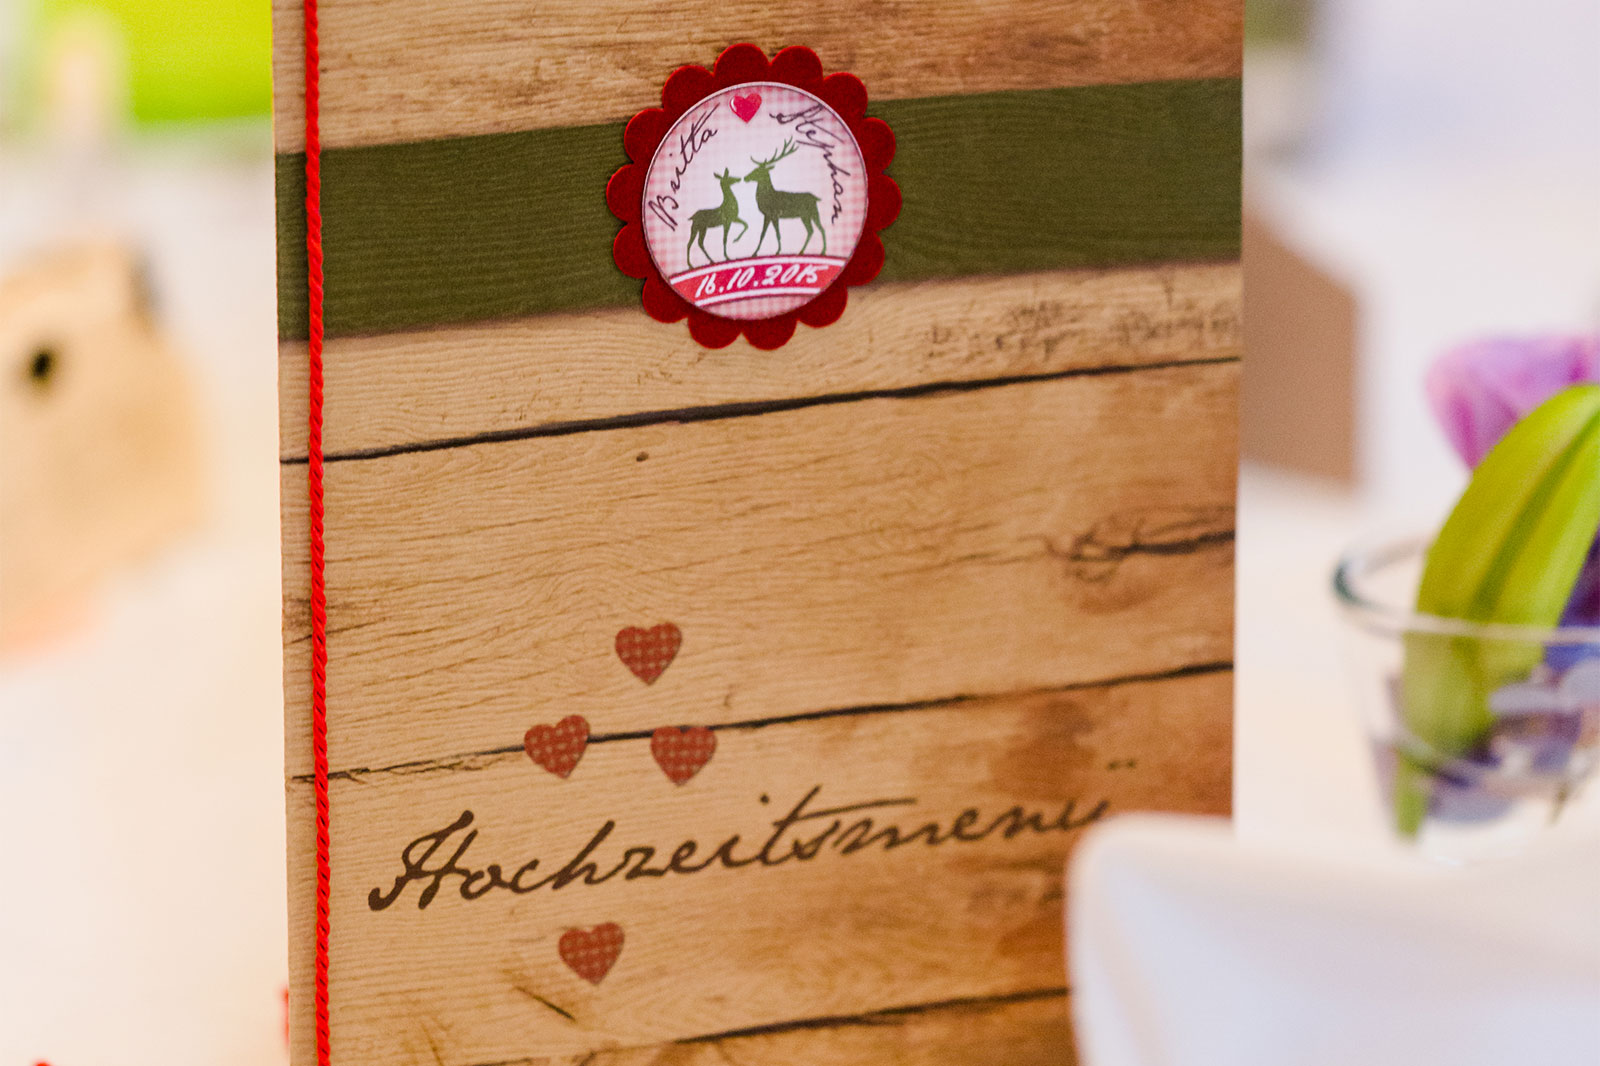 Tafelspitz & Tischkultur - Hochzeit Catering